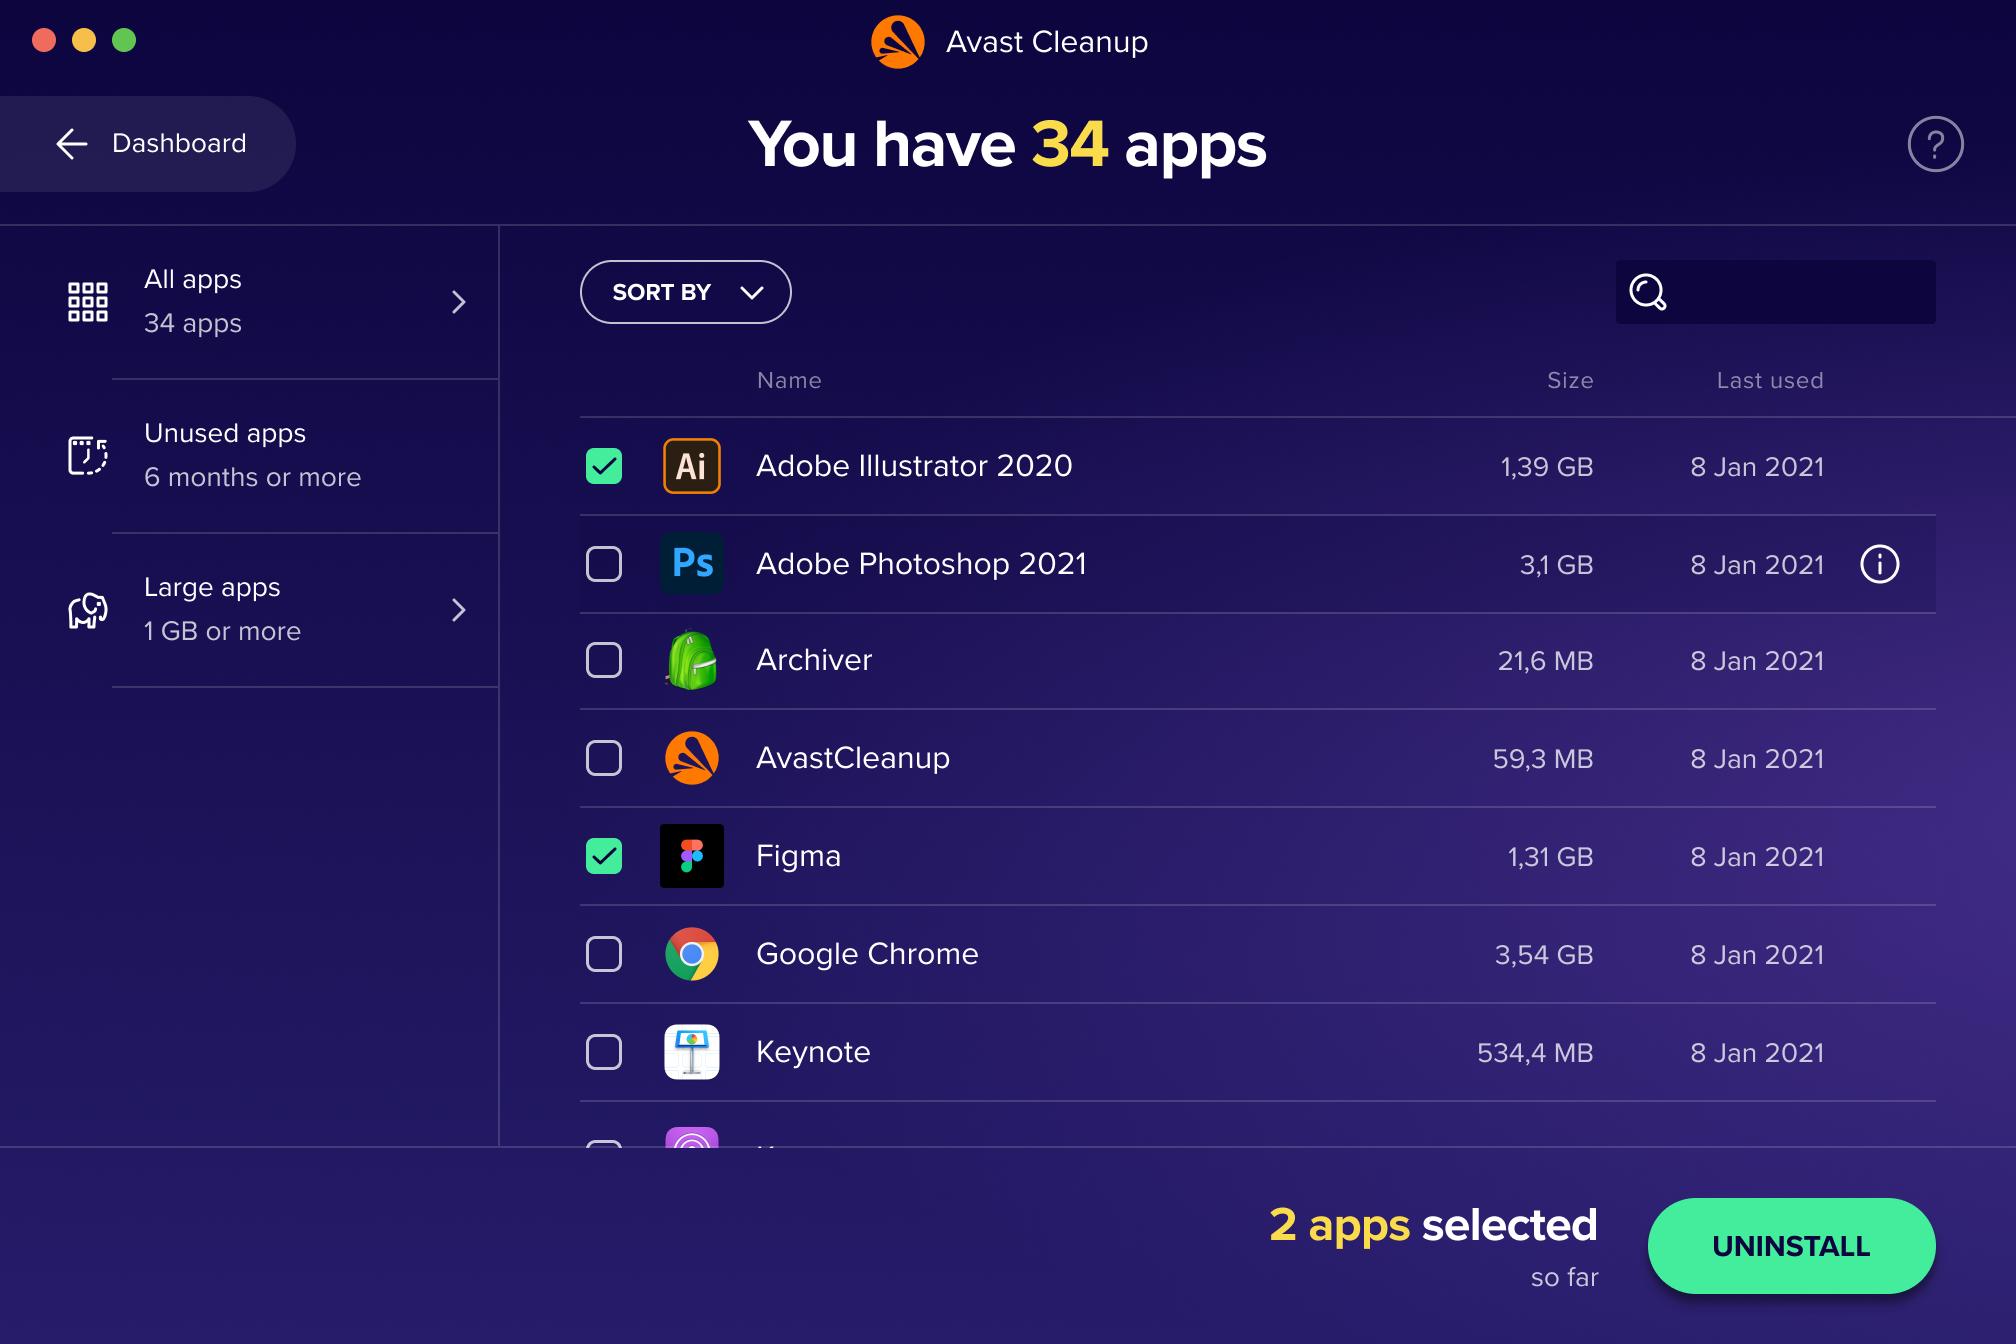 Application List